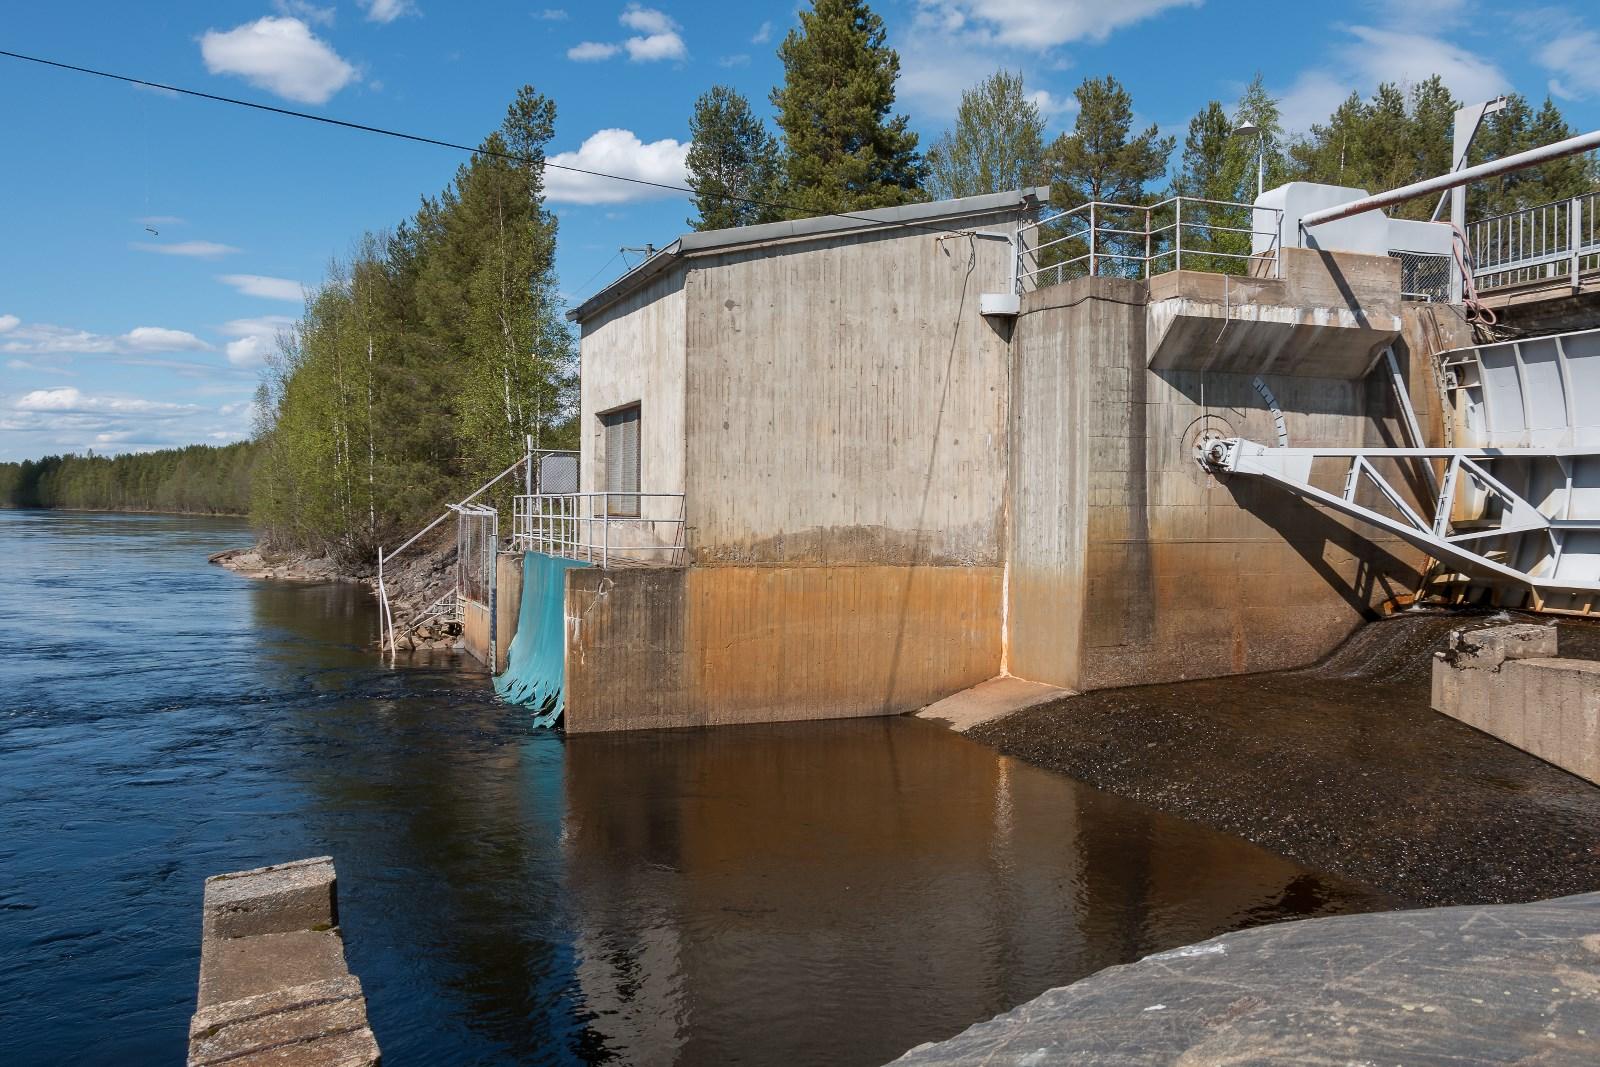 Ala-Utos hydro power plant